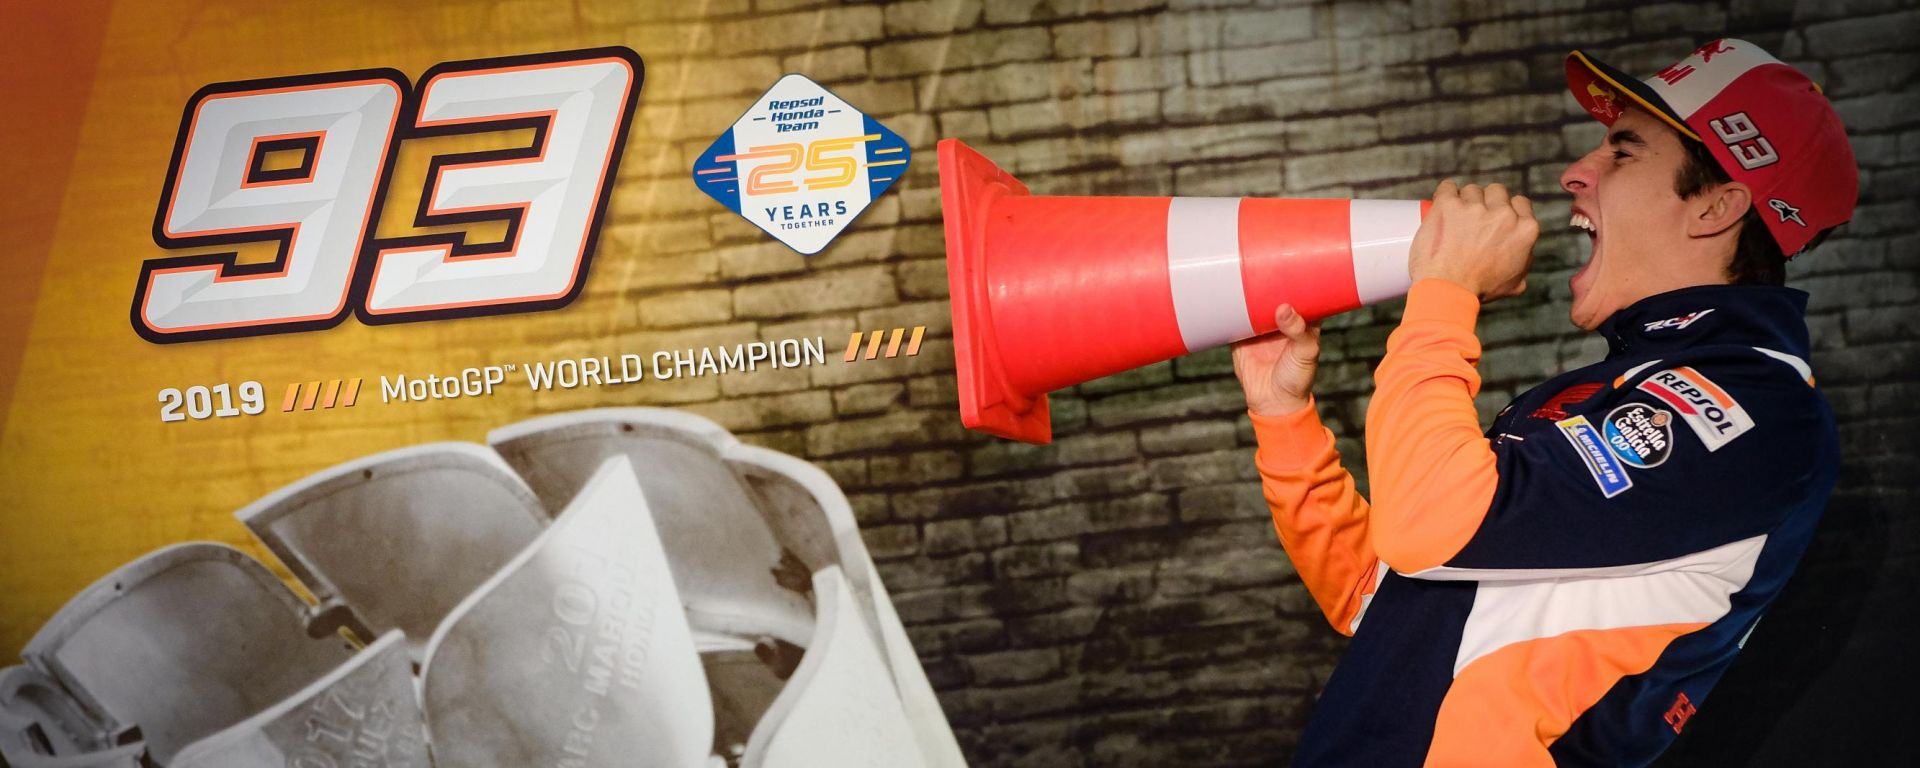 Marc Marquez campione del mondo 2019 della classe MotoGP